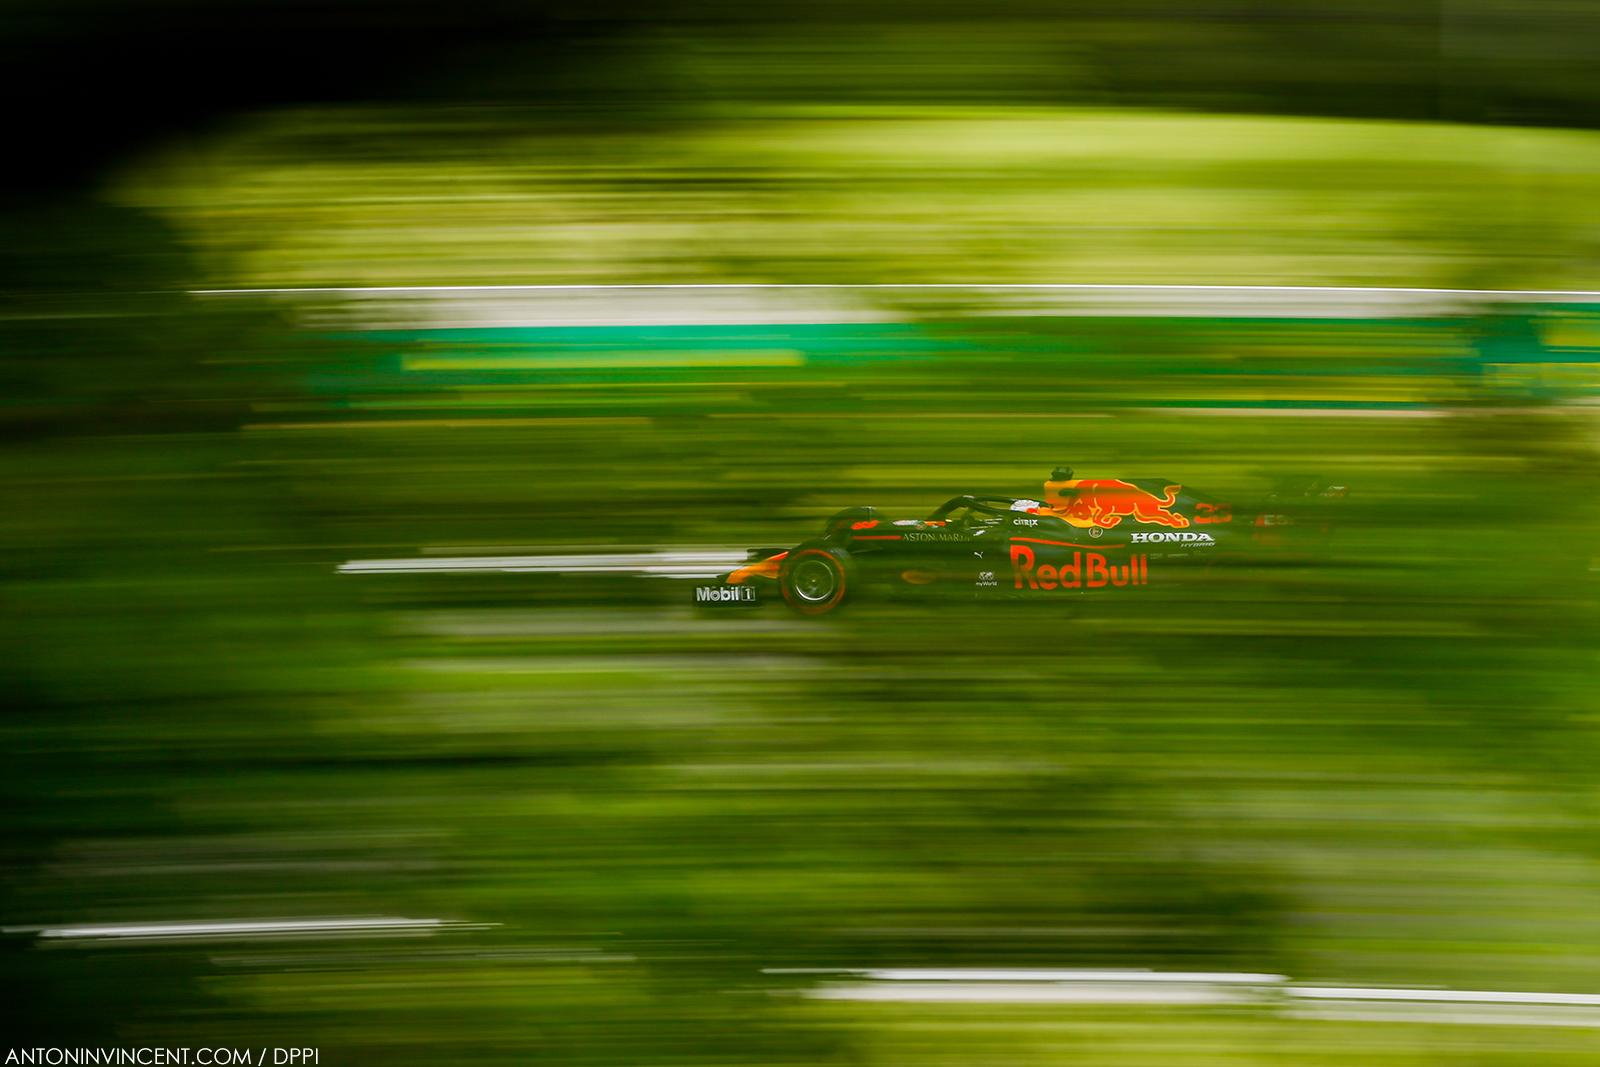 F1 – HUNGARIAN GRAND PRIX 2020